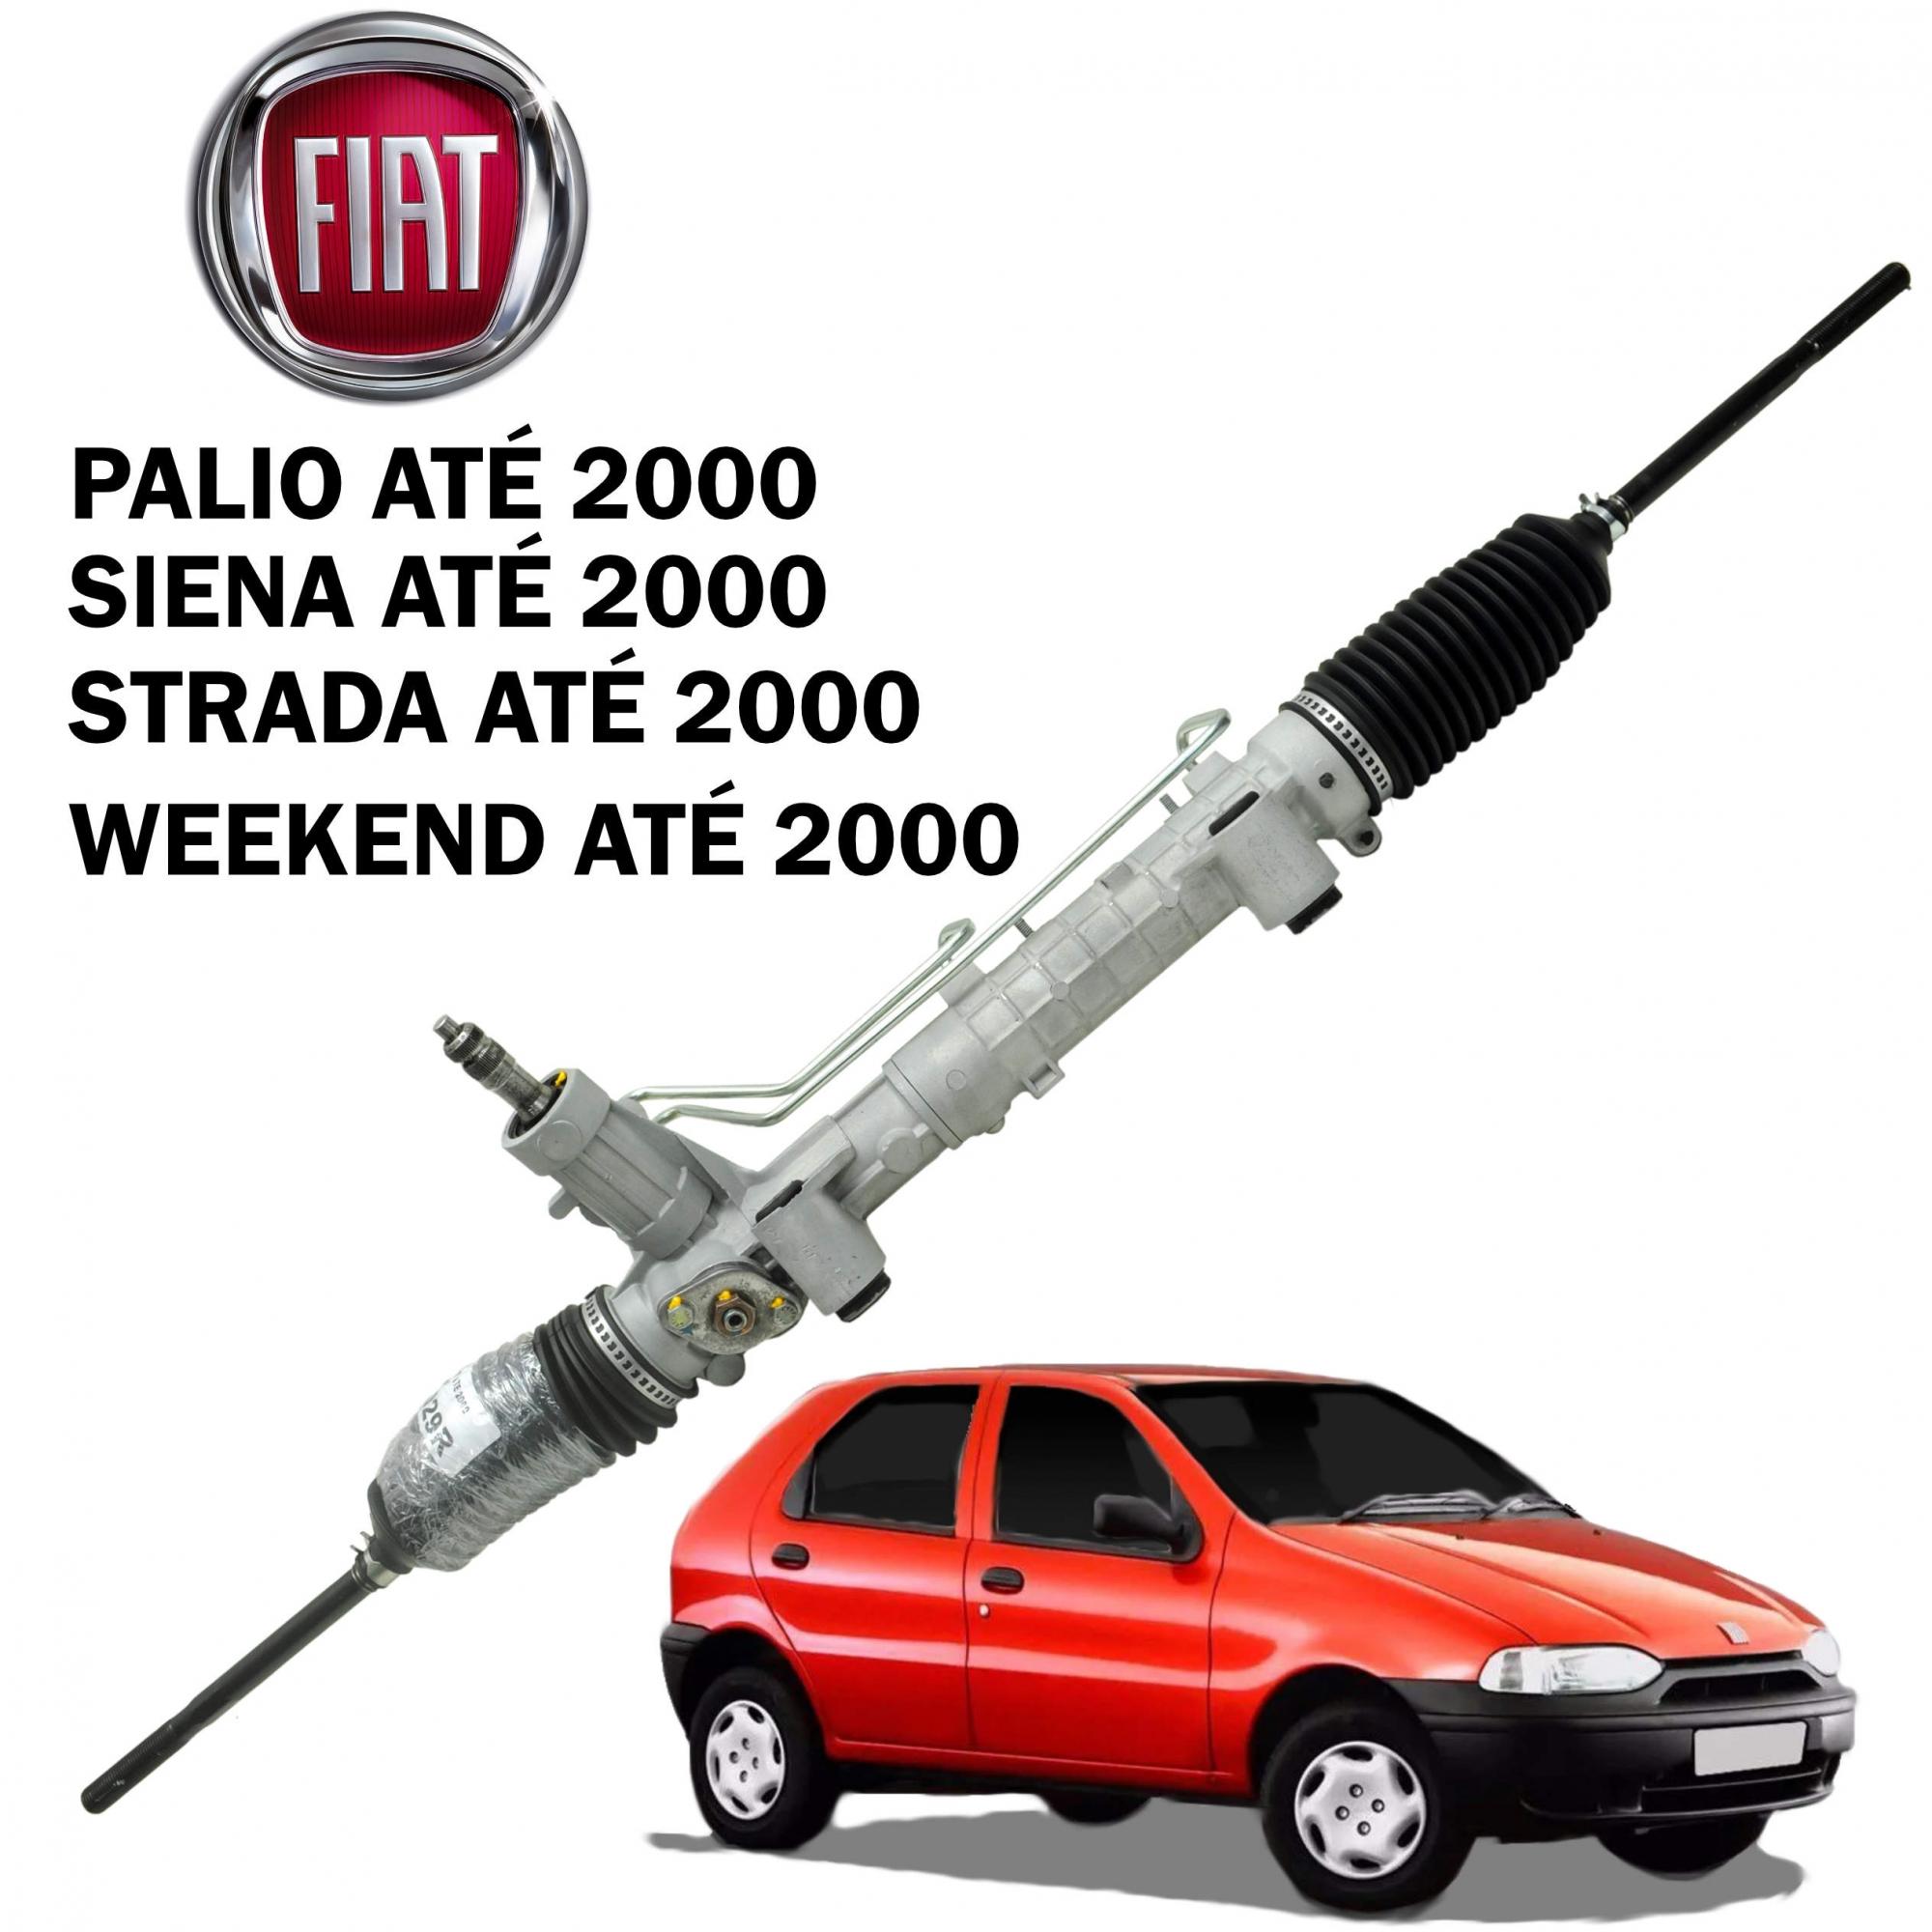 Caixa Direção Hidráulica TRW Palio, Strada , Siena 96...00